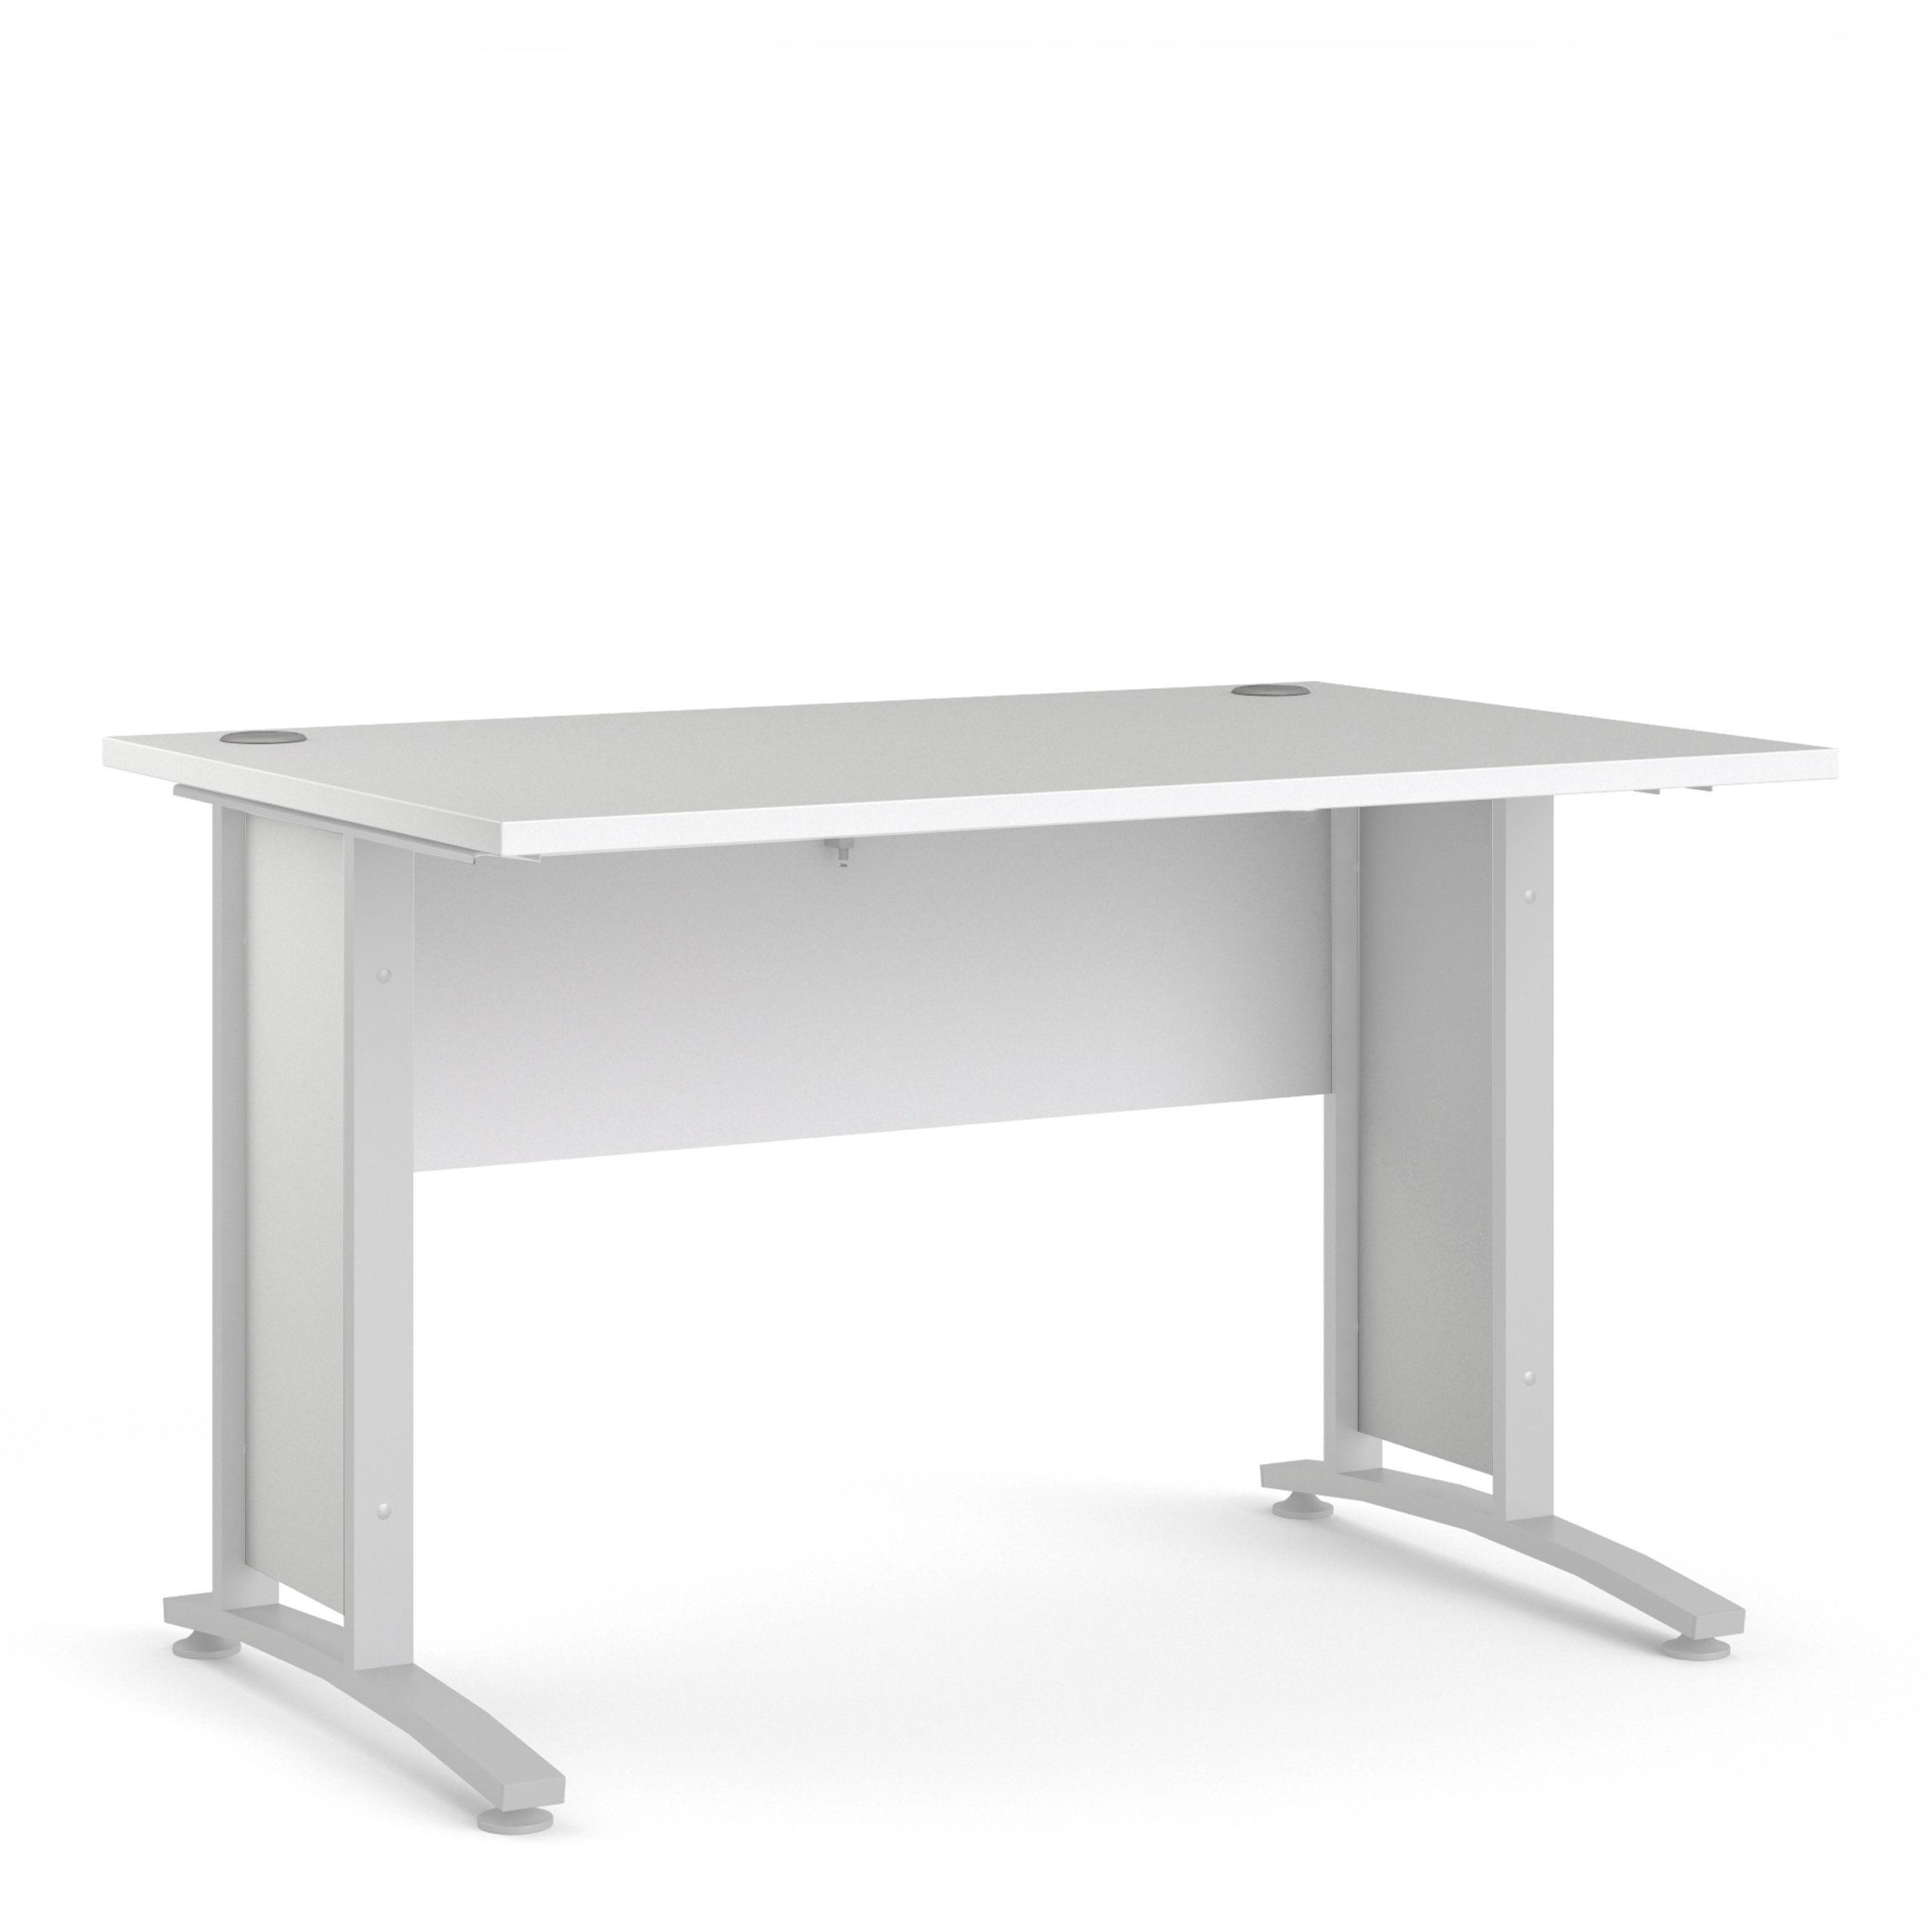 Kansas Desk 120 cm in White with White Legs   Self Assembly